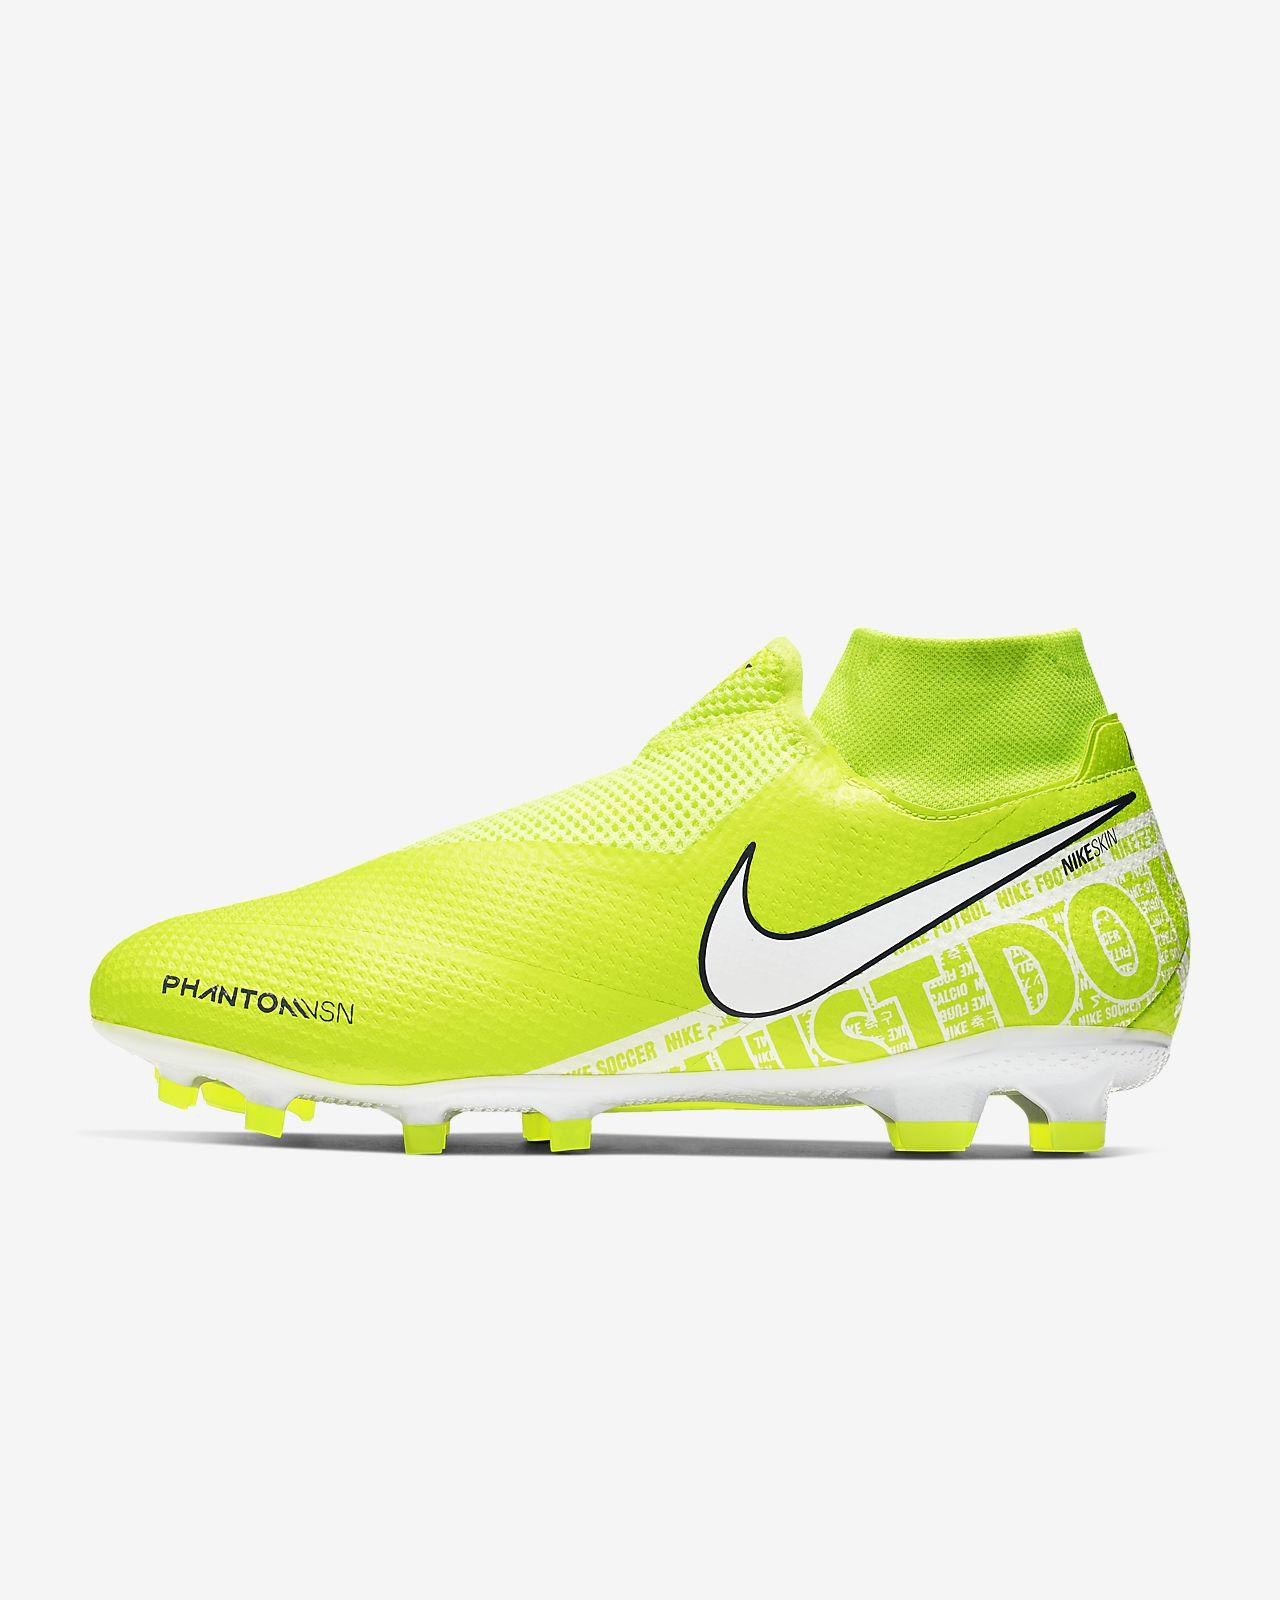 Scarpa da calcio per terreni duri Nike Phantom Vision Pro Dynamic Fit FG